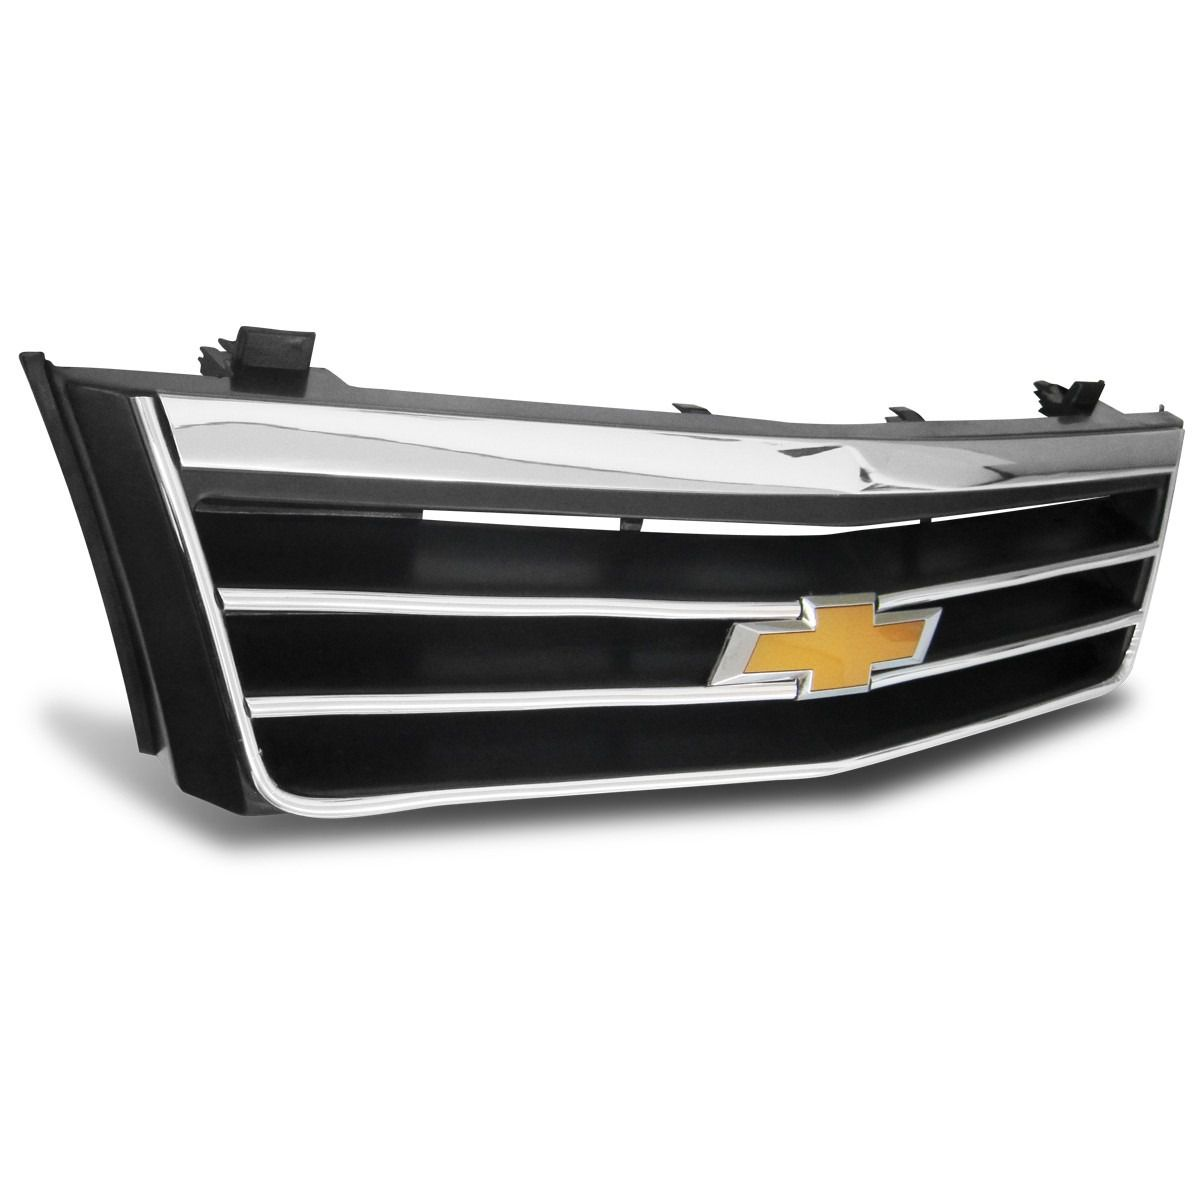 Grade tuning Monza até 90 com Frisos Cromado  Emblema Agile